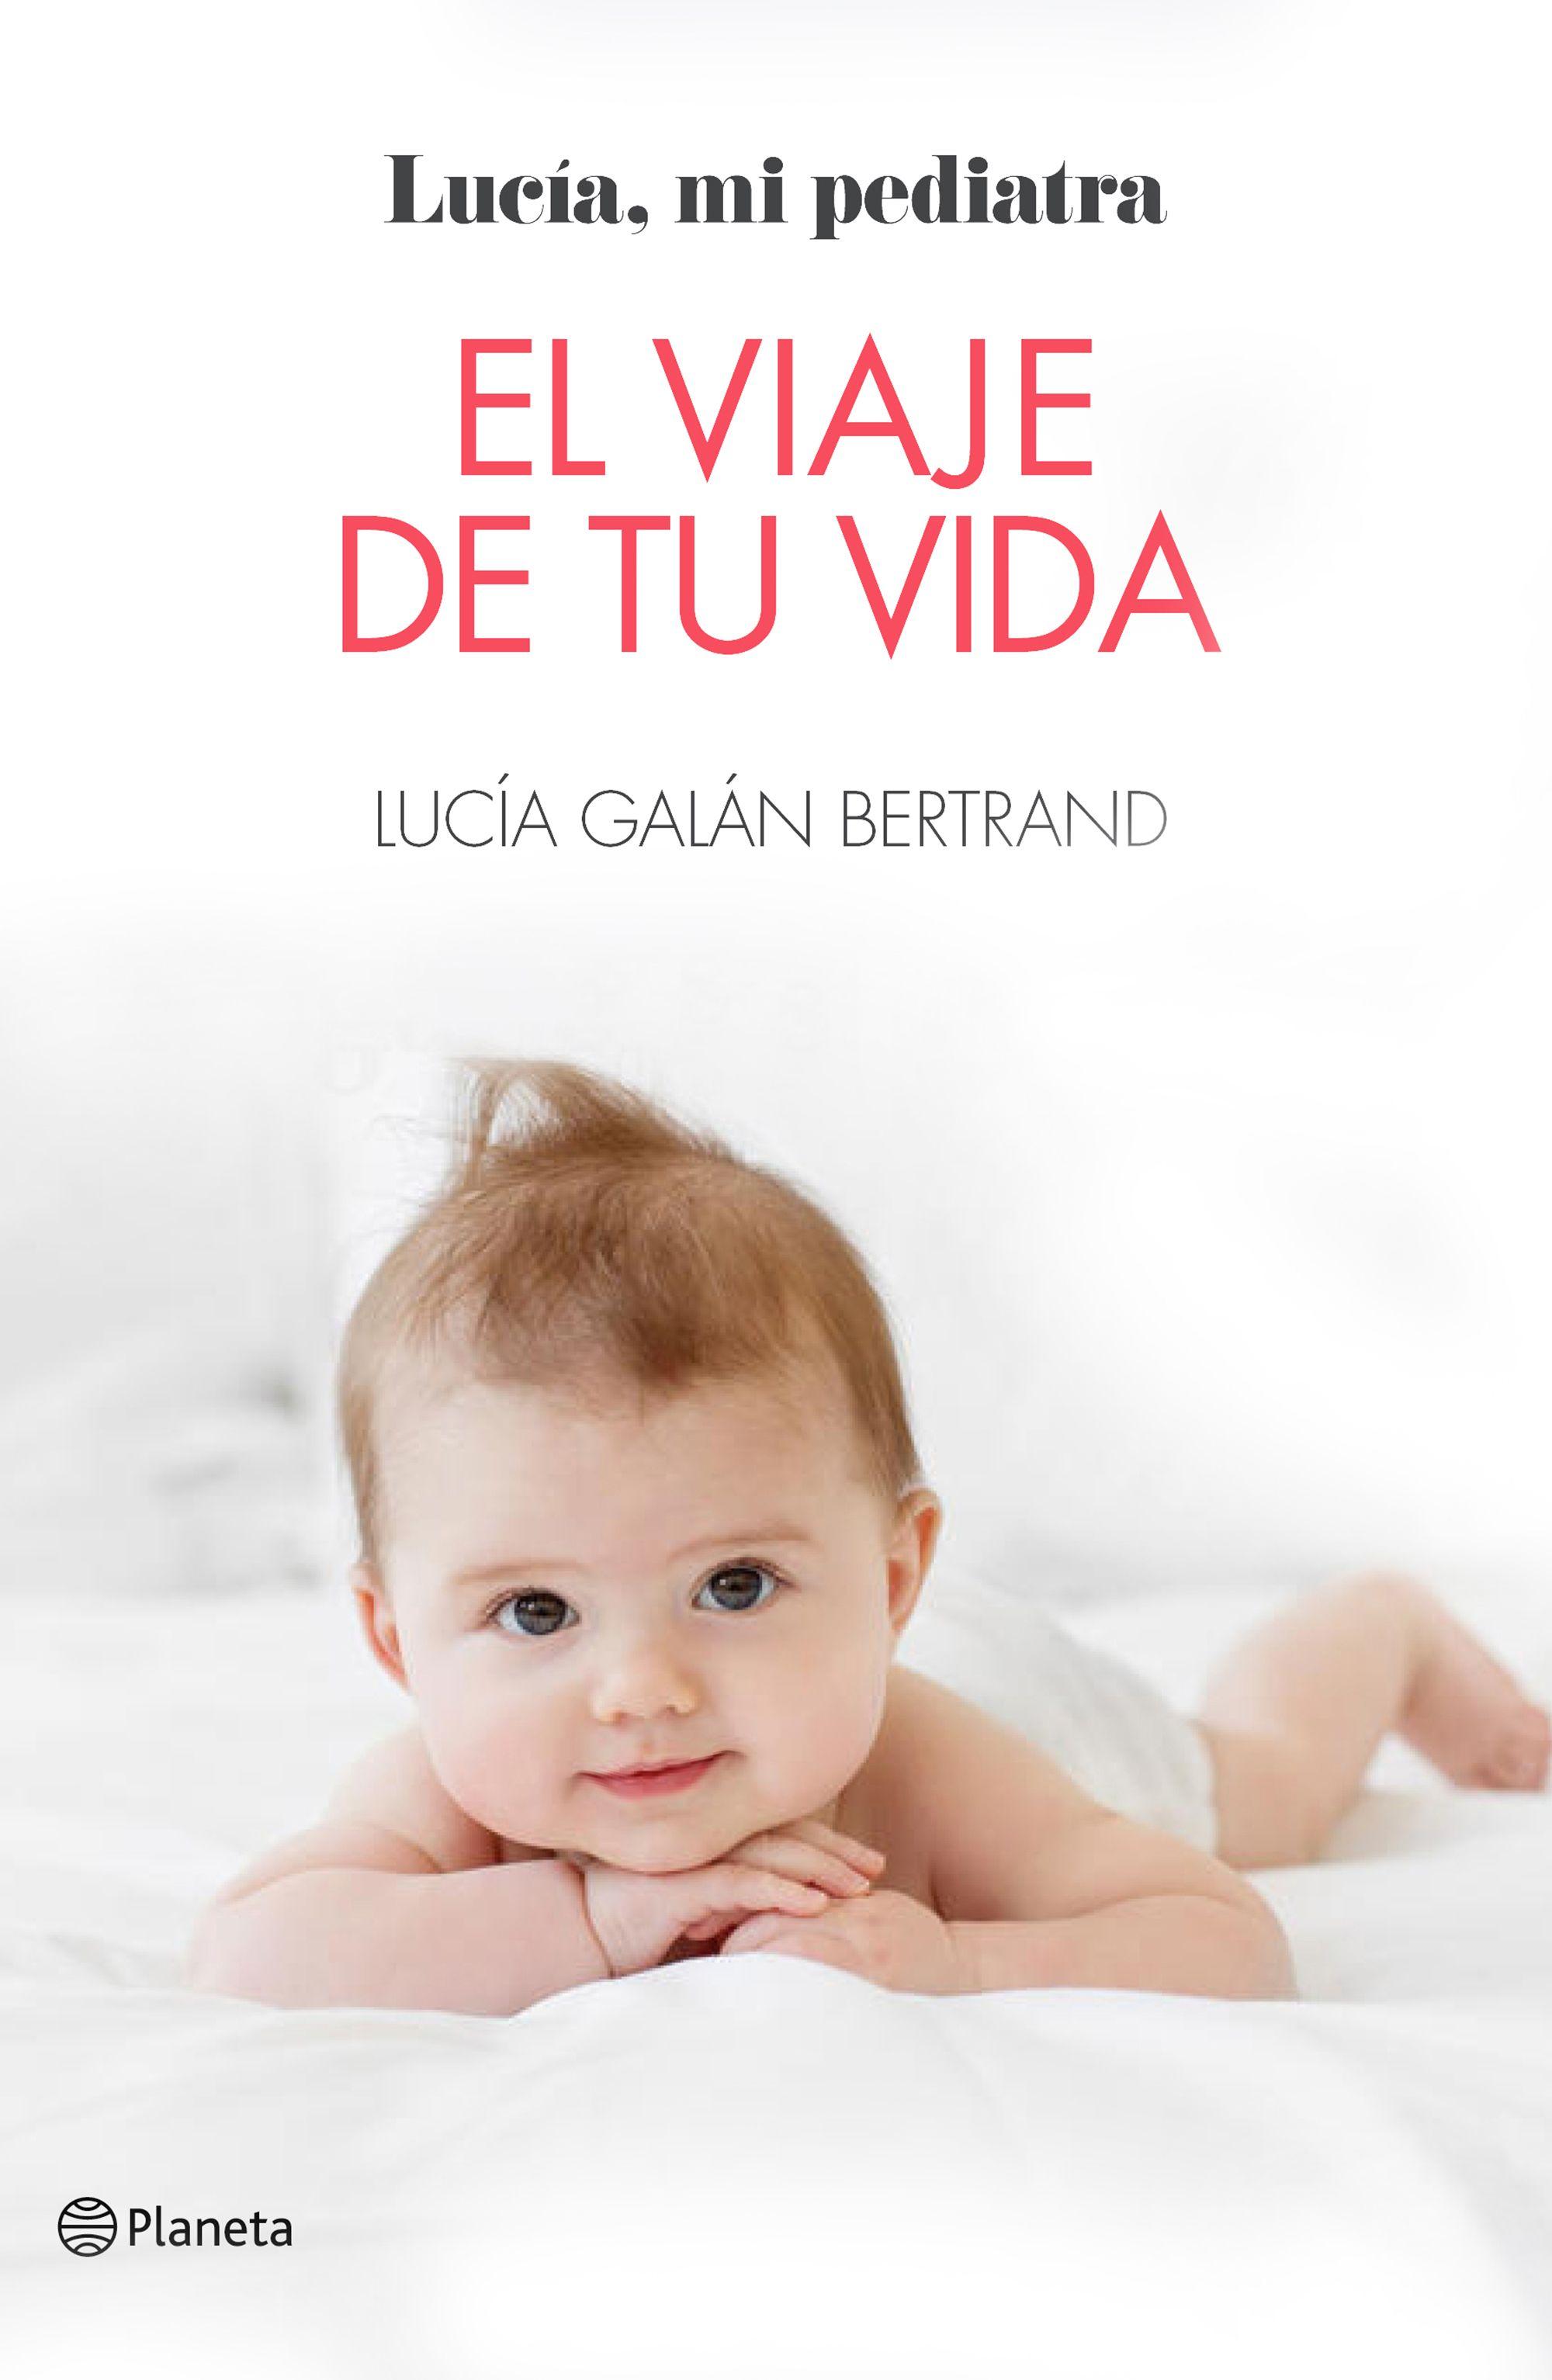 b8a4bba933 Próximos talleres y conferencias en España AQUÍ.